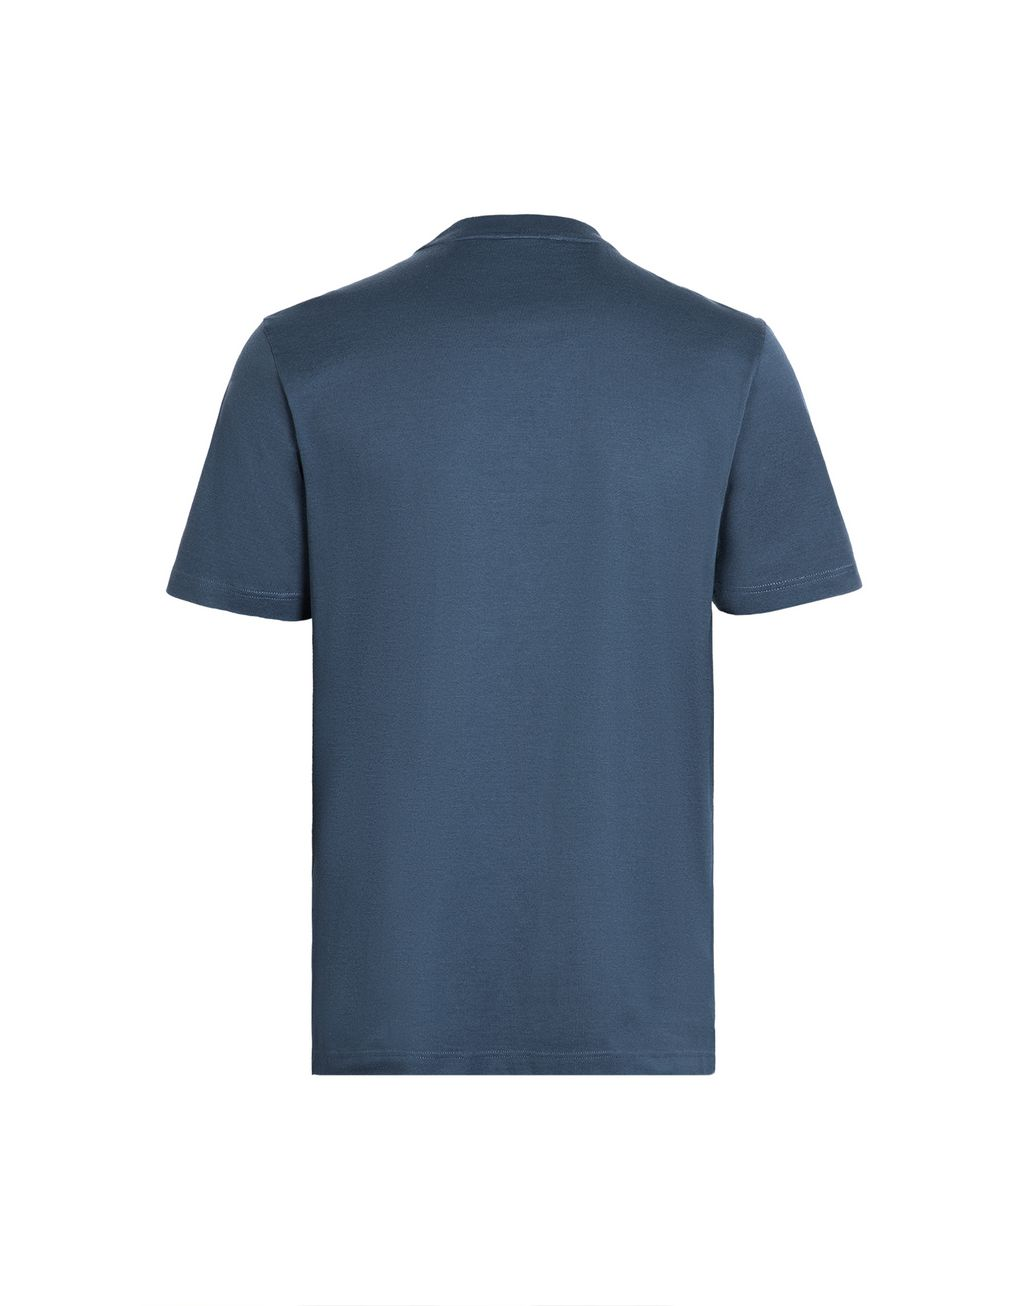 BRIONI Petrol Blue T-Shirt T-Shirts & Polos Man d